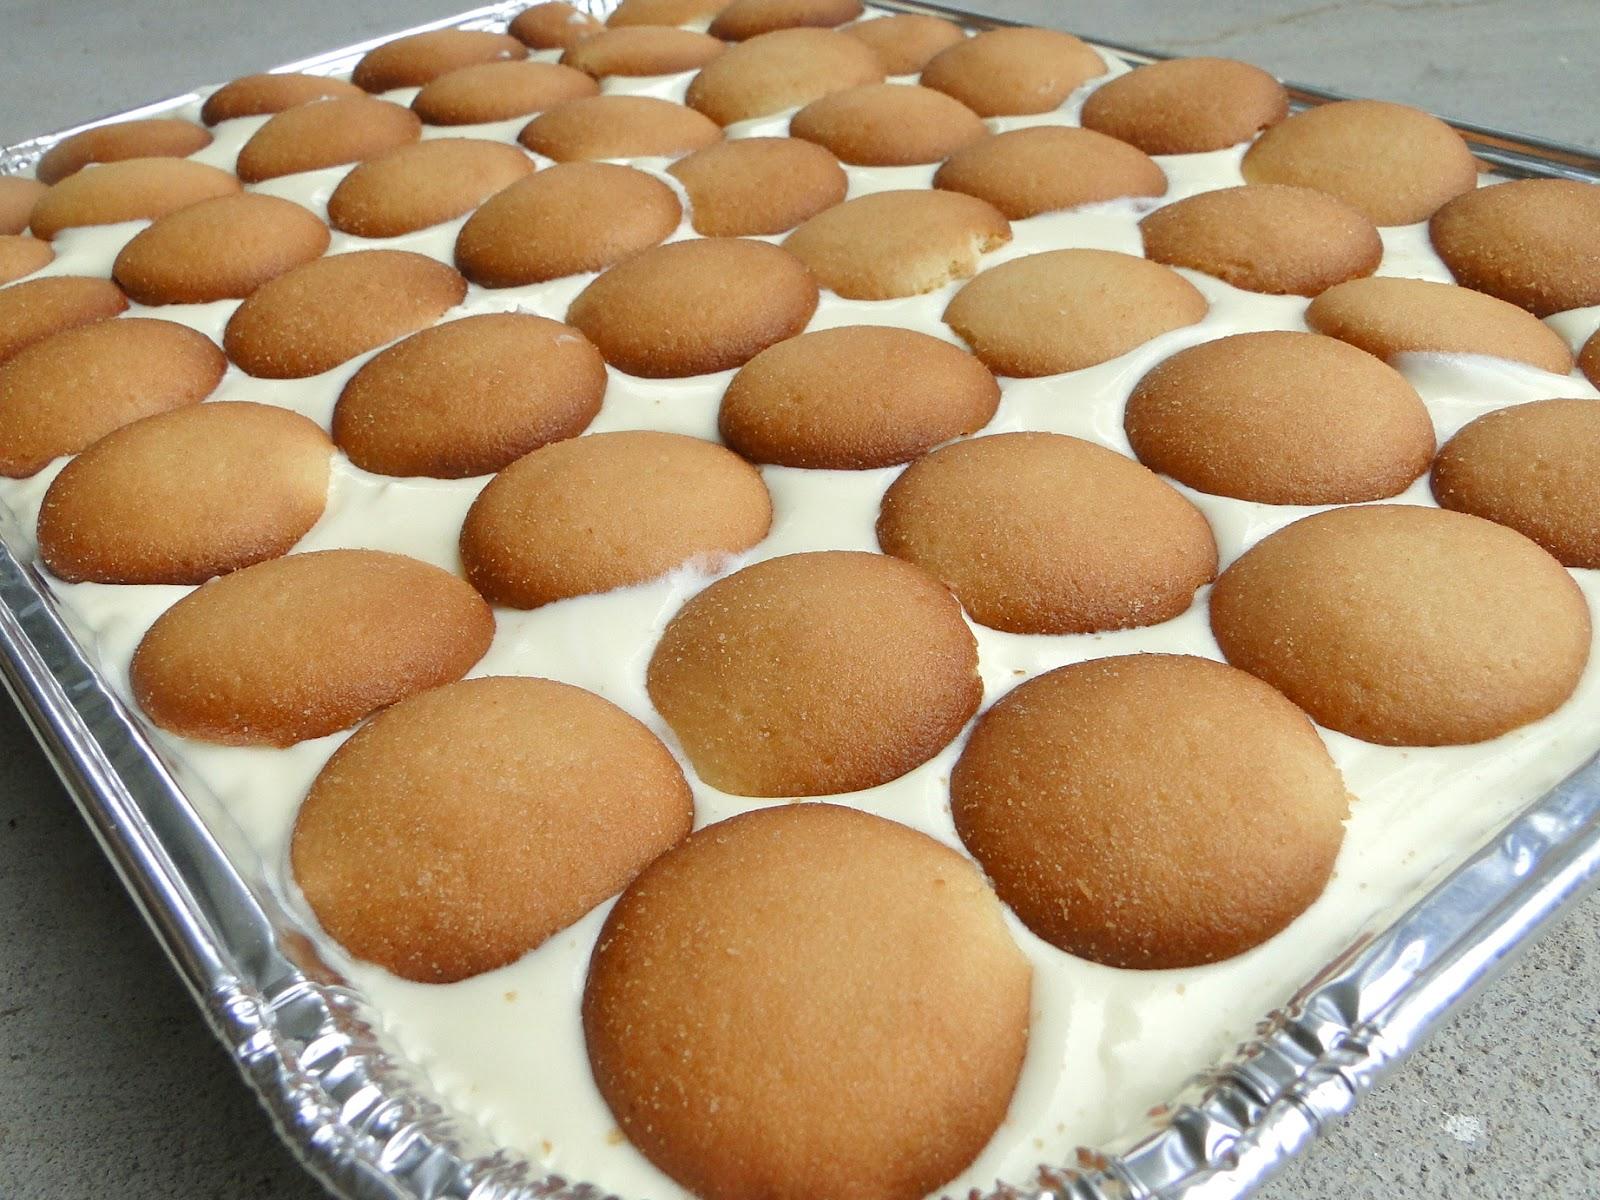 How Yo Make Cake From Scratch